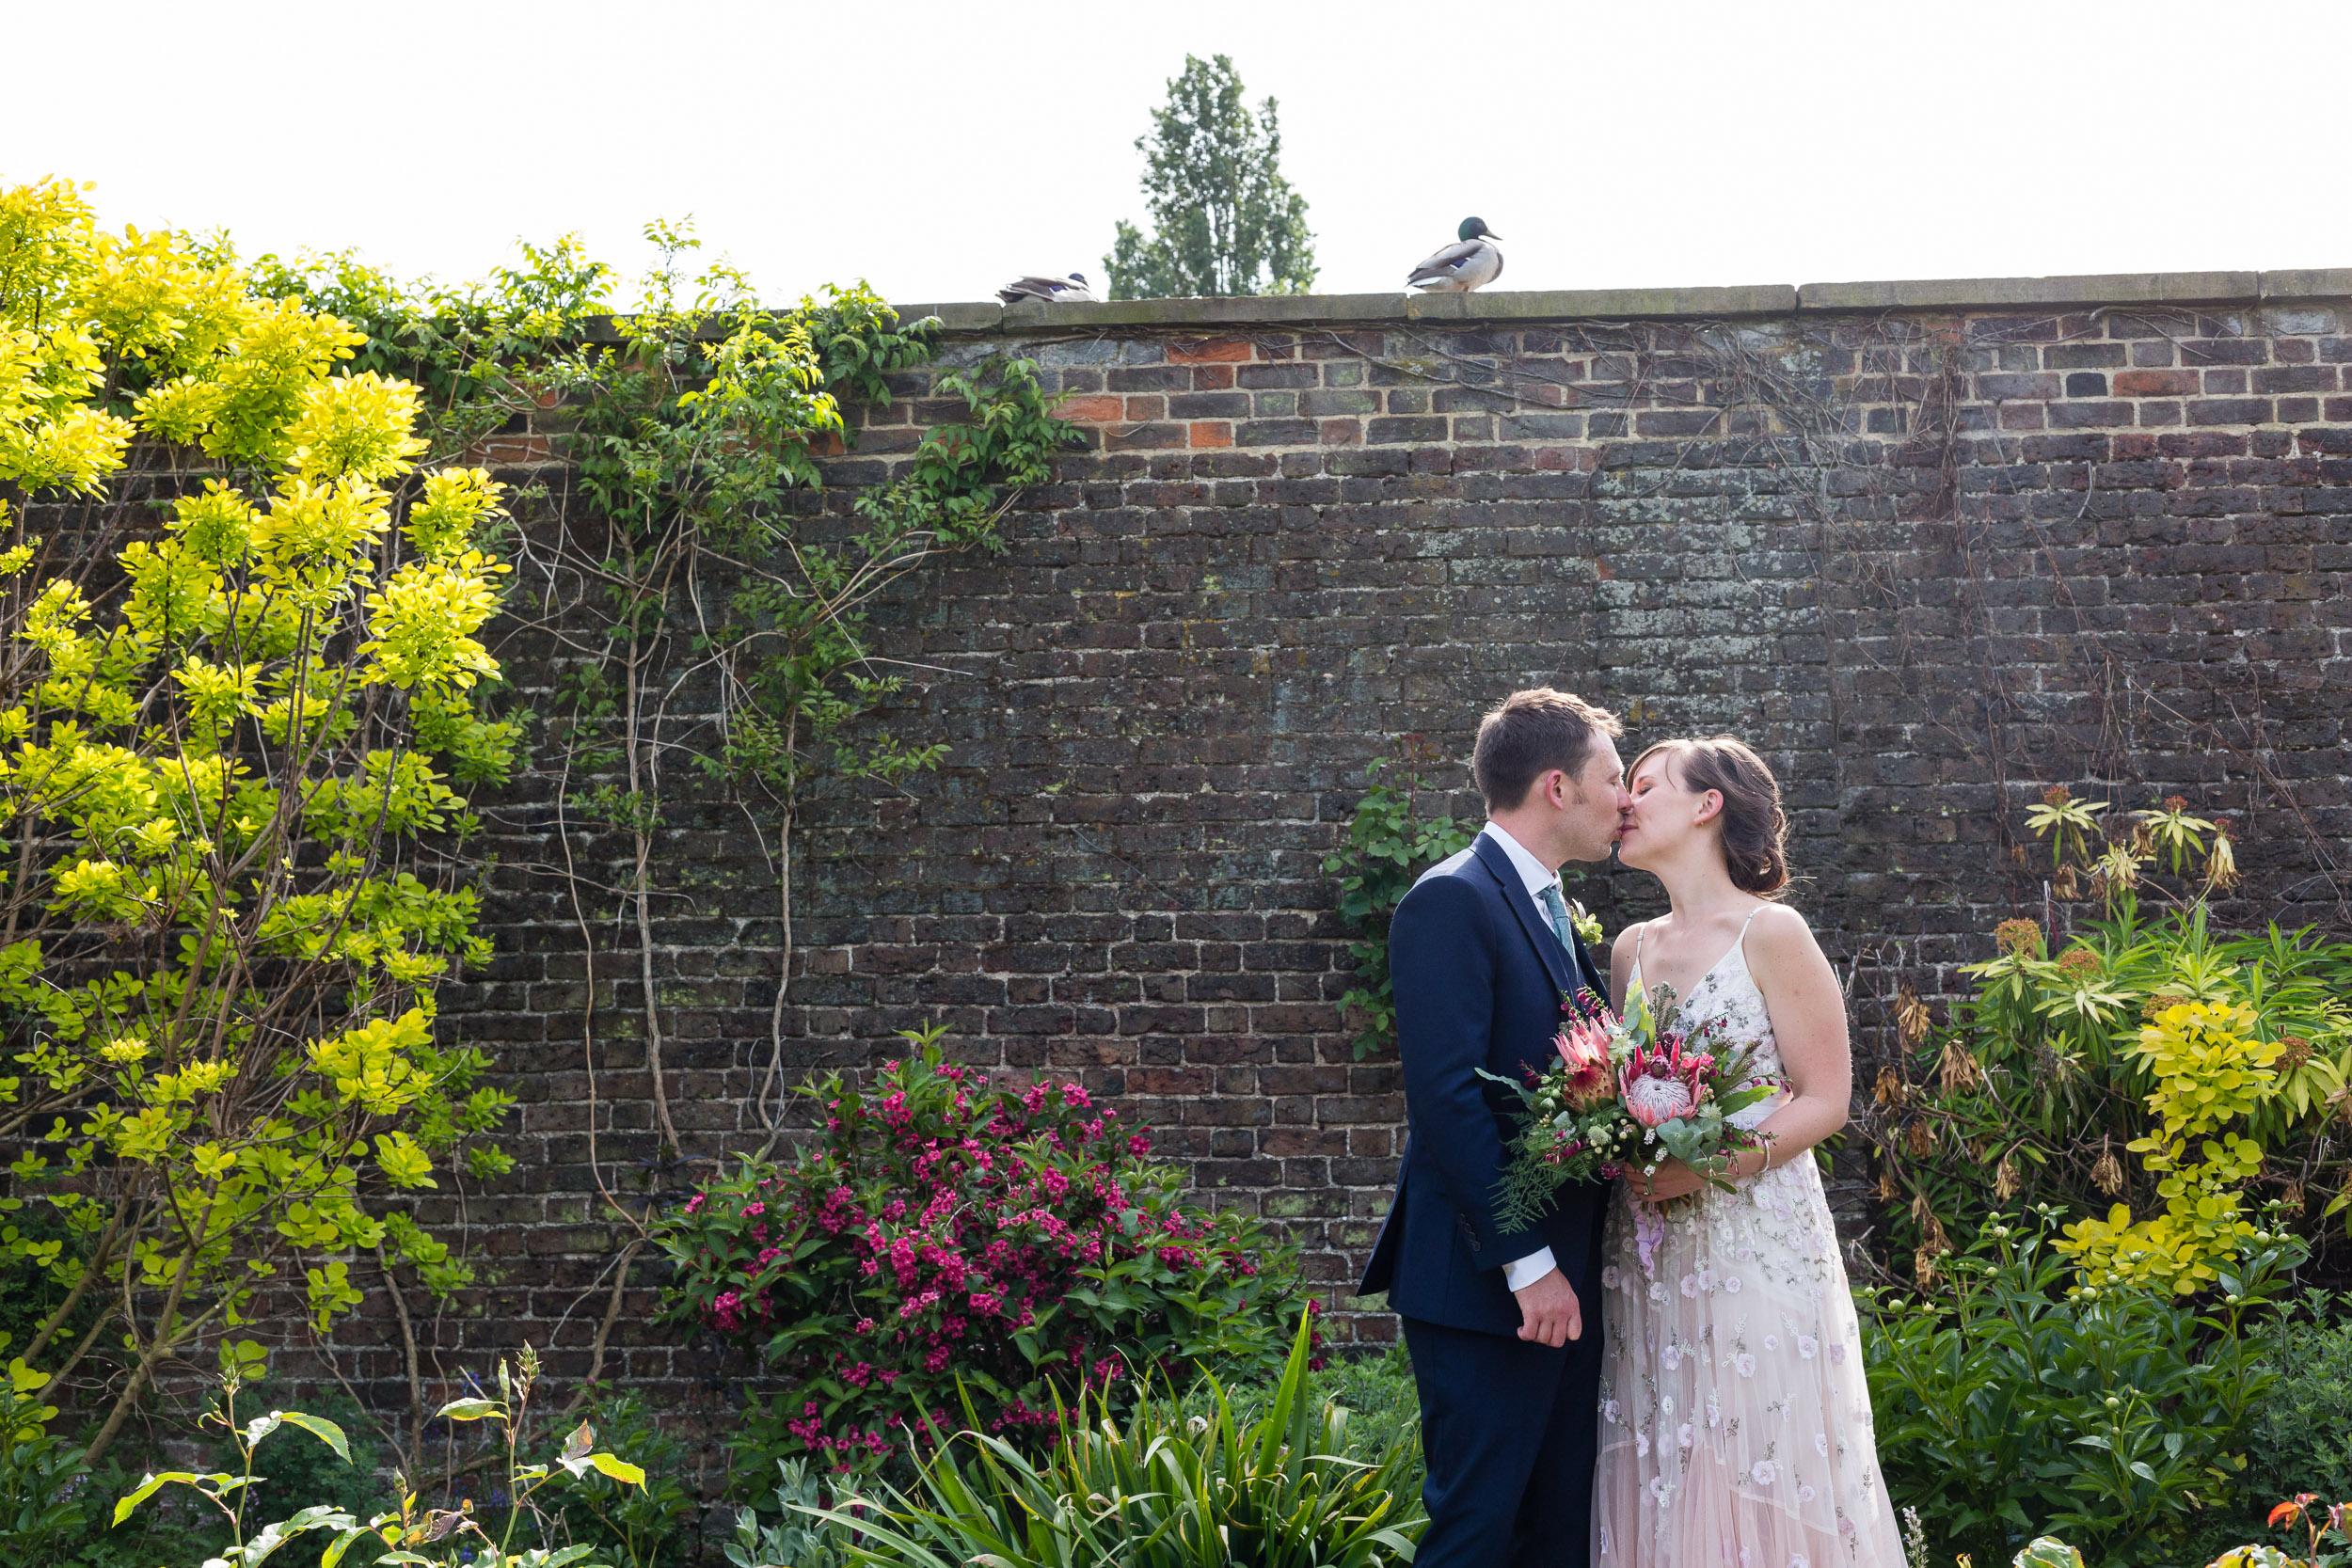 brockwell-lido-brixton-herne-hill-wedding-272.jpg